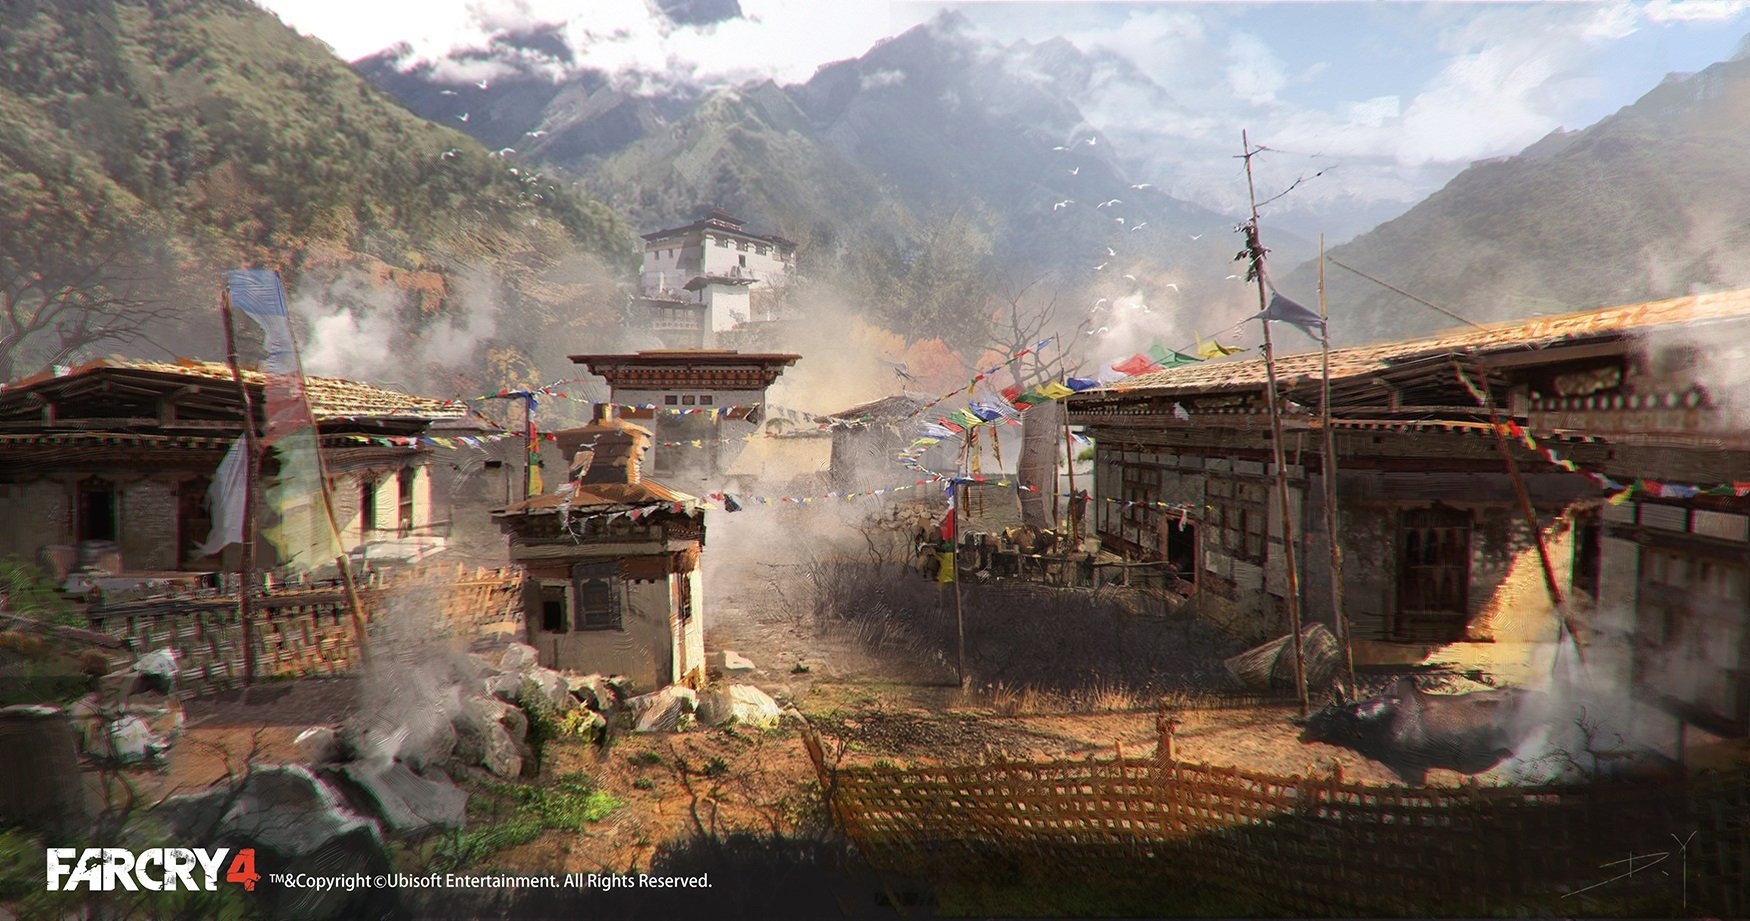 inside village